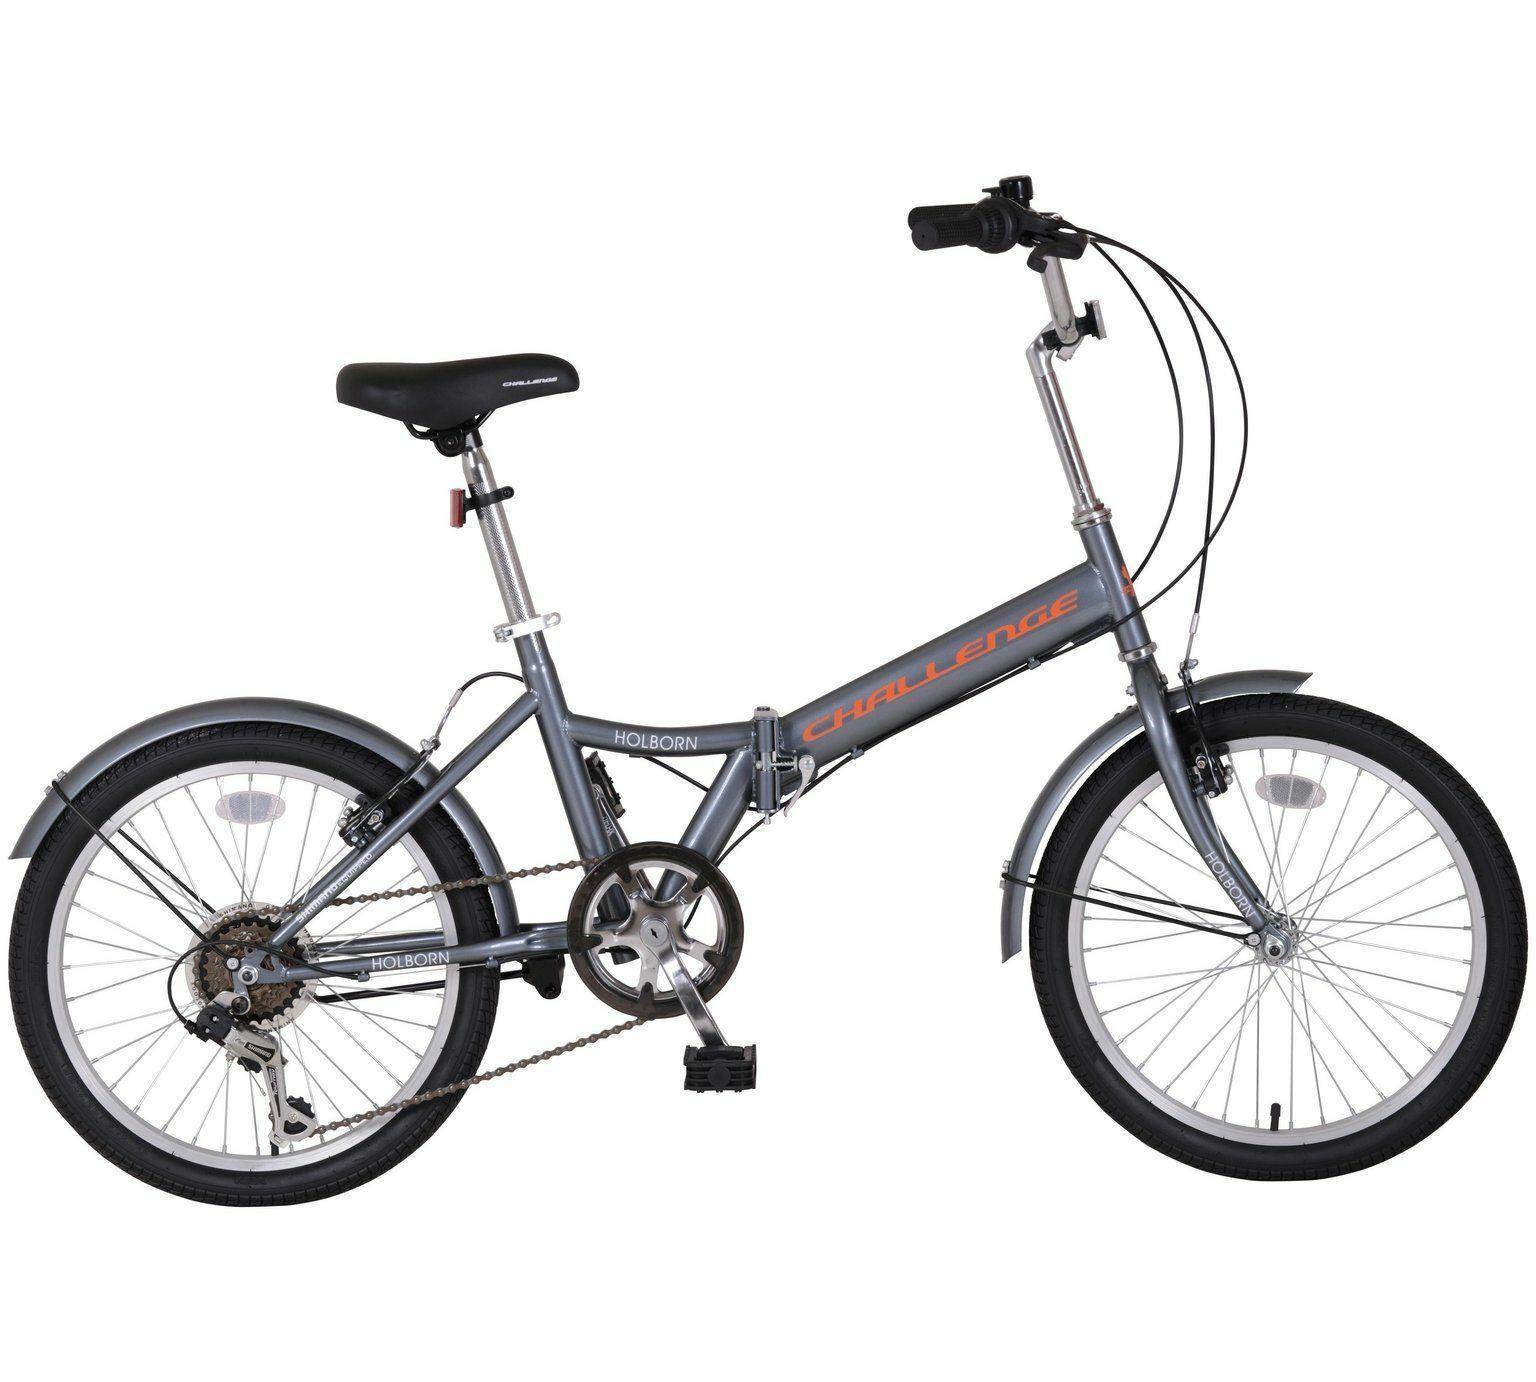 "Challenge Holborn 20"" Inch Wheel Folding Commuting Bike Bicycle 6 Gear Unisex"